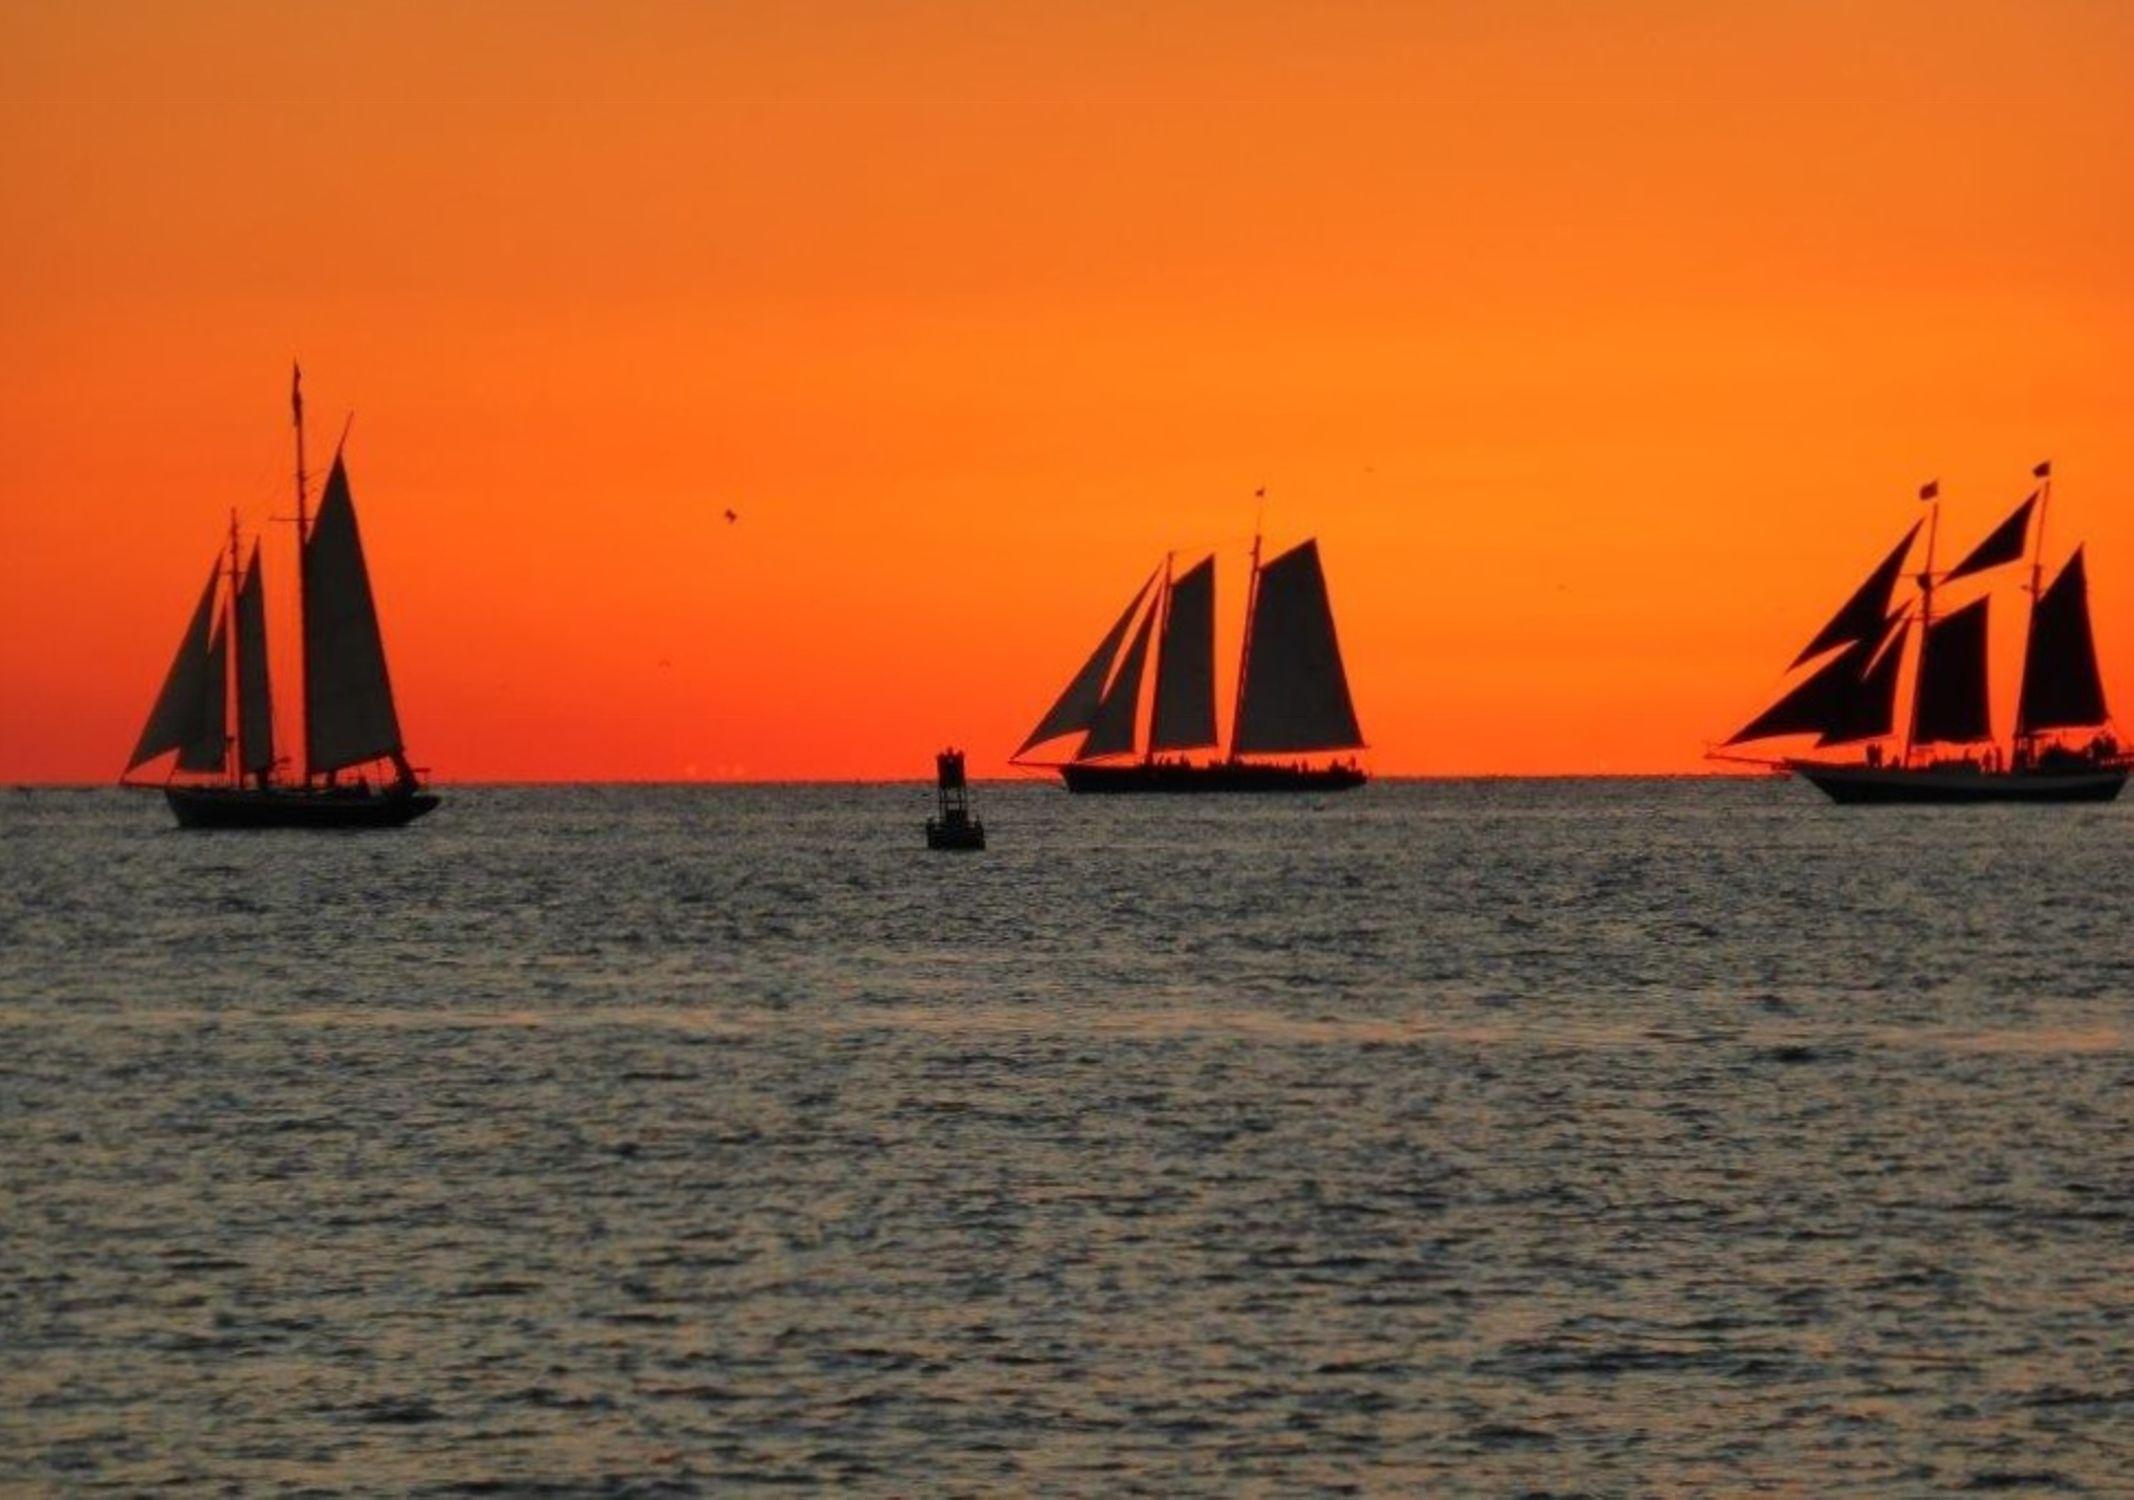 Bild mit Natur, Sonnenuntergang, Segelboote, Sonnenaufgang, Meerblick, Segelboot, boot, Meer, Boote, Landschaft, USA